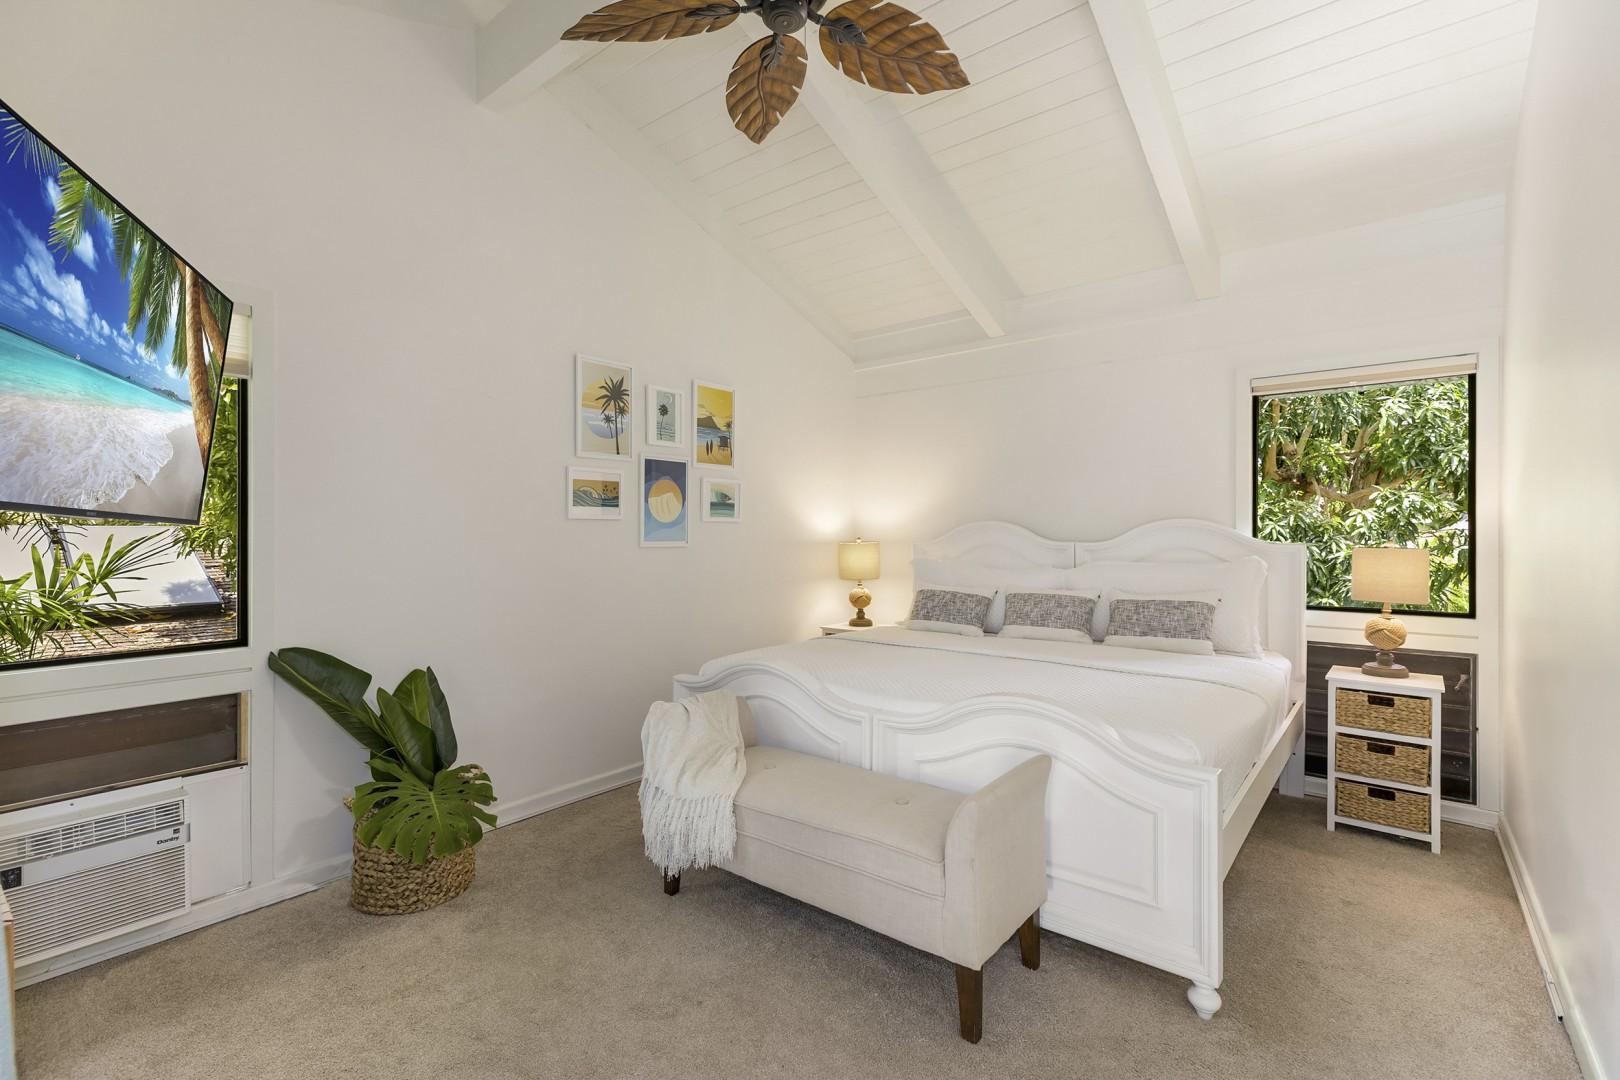 Upstairs Guest Bedroom with Ensuite Bathroom